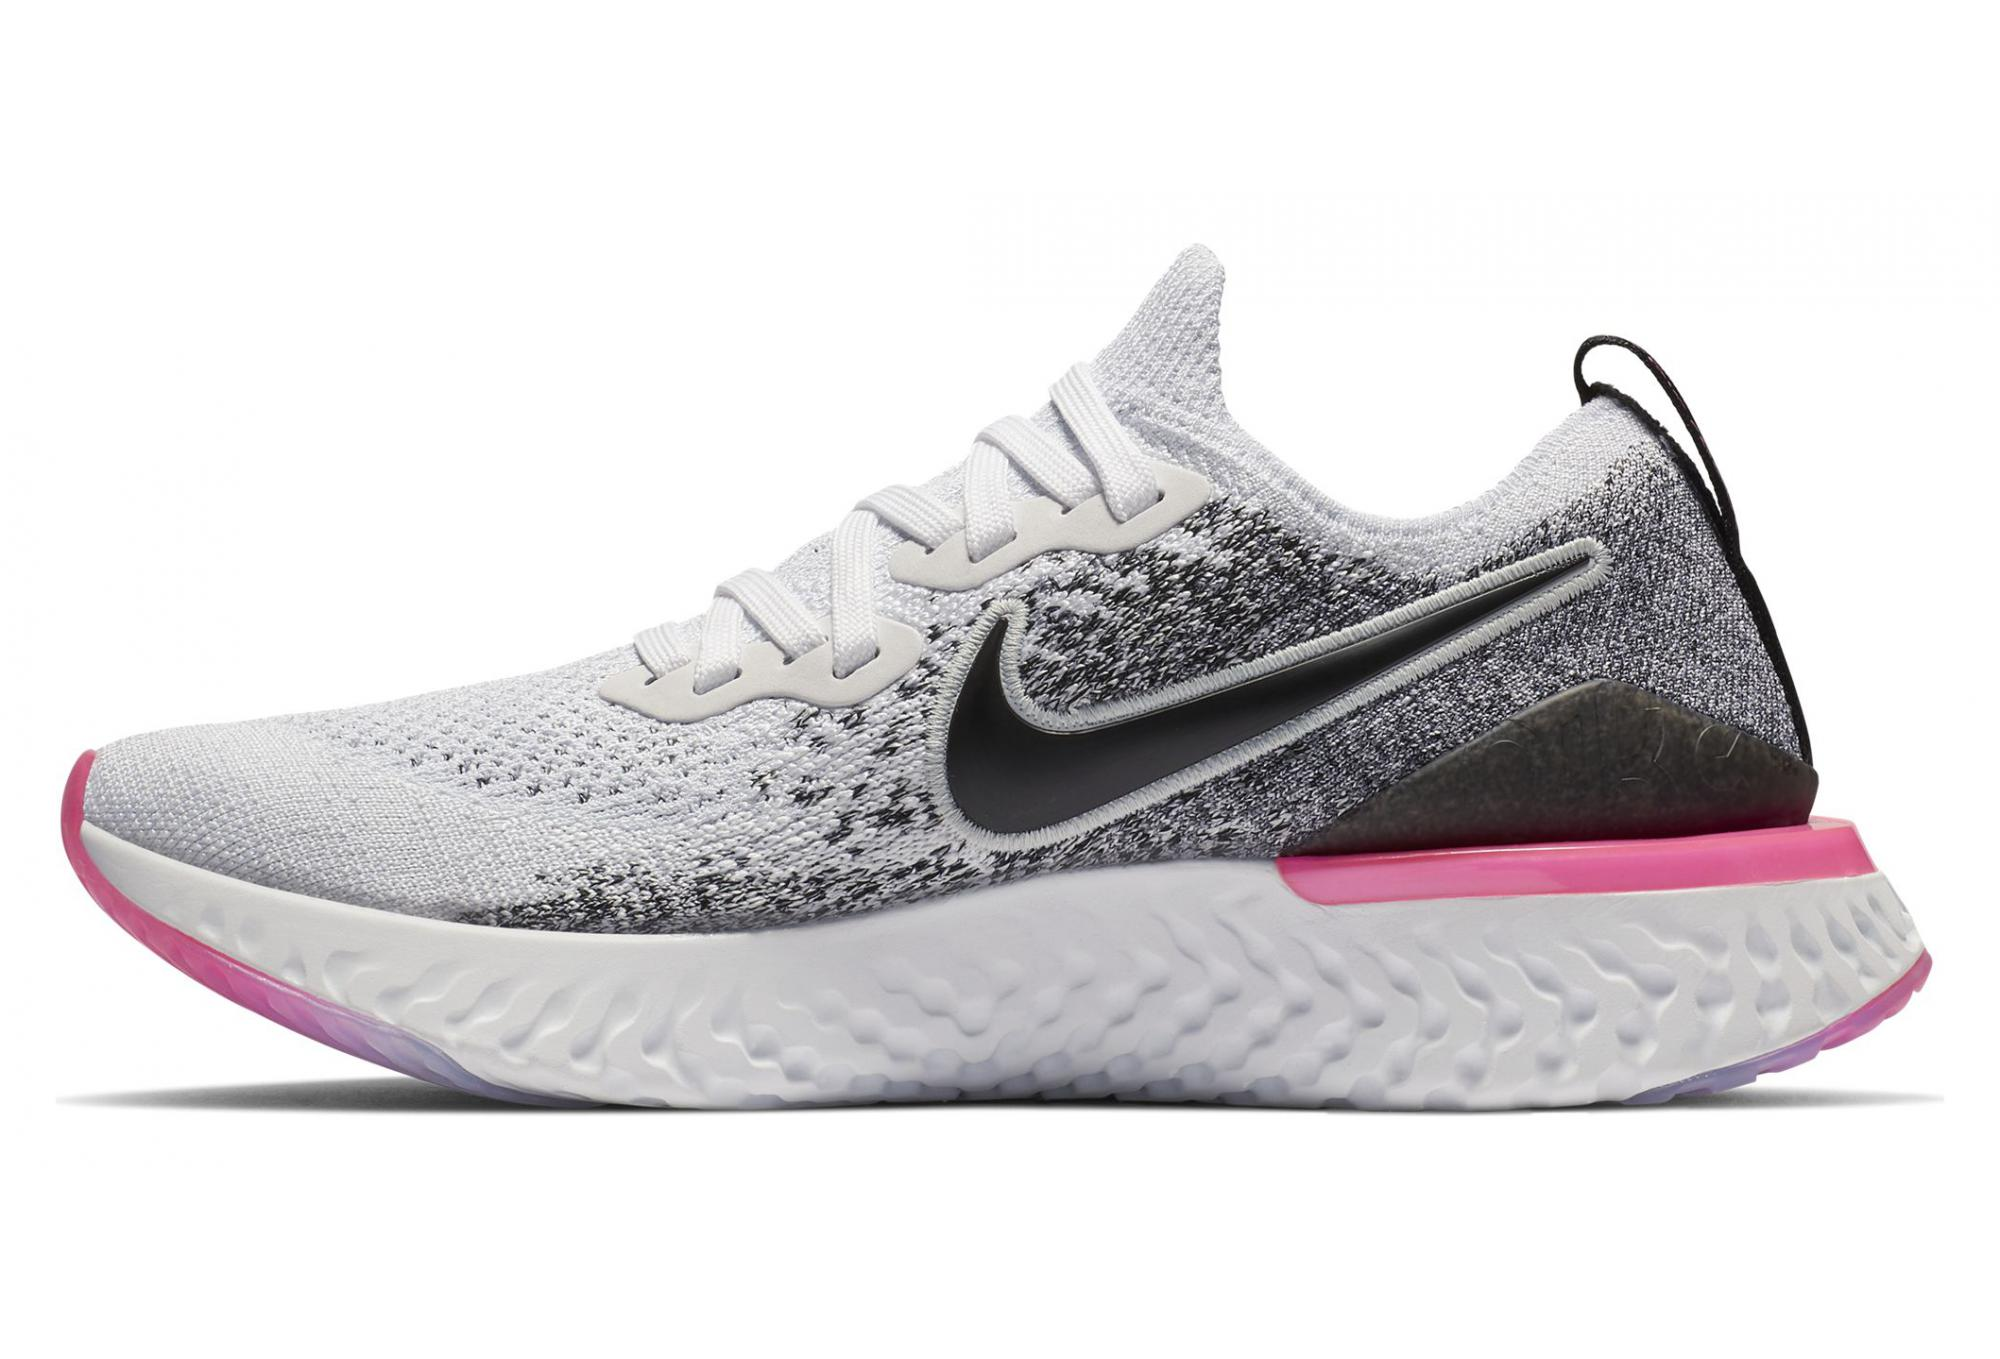 Nike Zapatilla W NIKE EPIC REACT FLYKNIT 2 Mujer Zapatillas Running 36,5